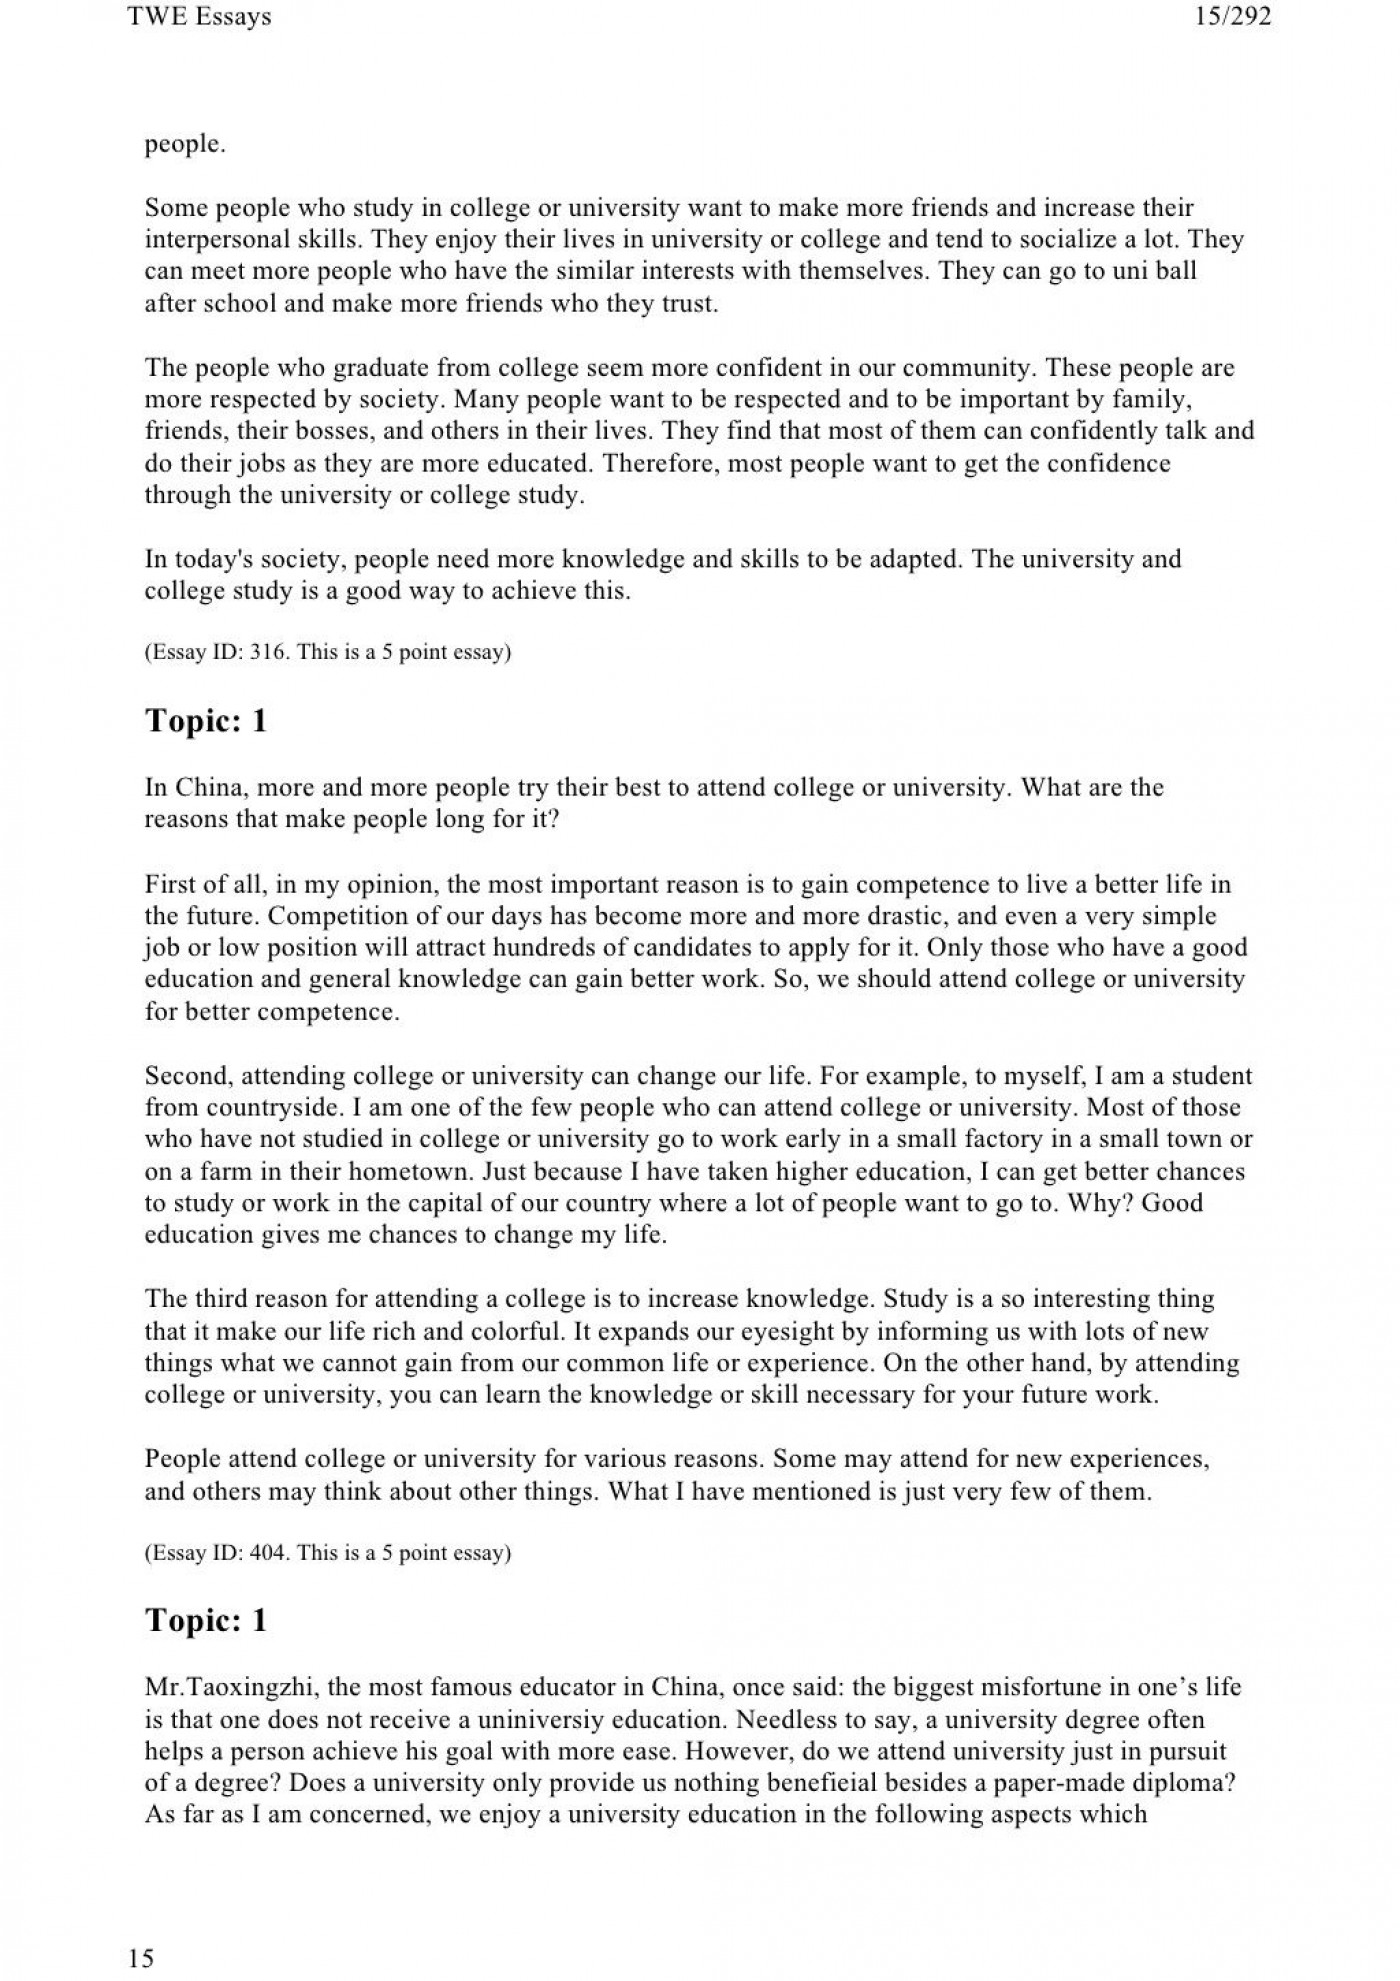 004 Toefl Ibt Essay Topics Example Striking 2015 1400